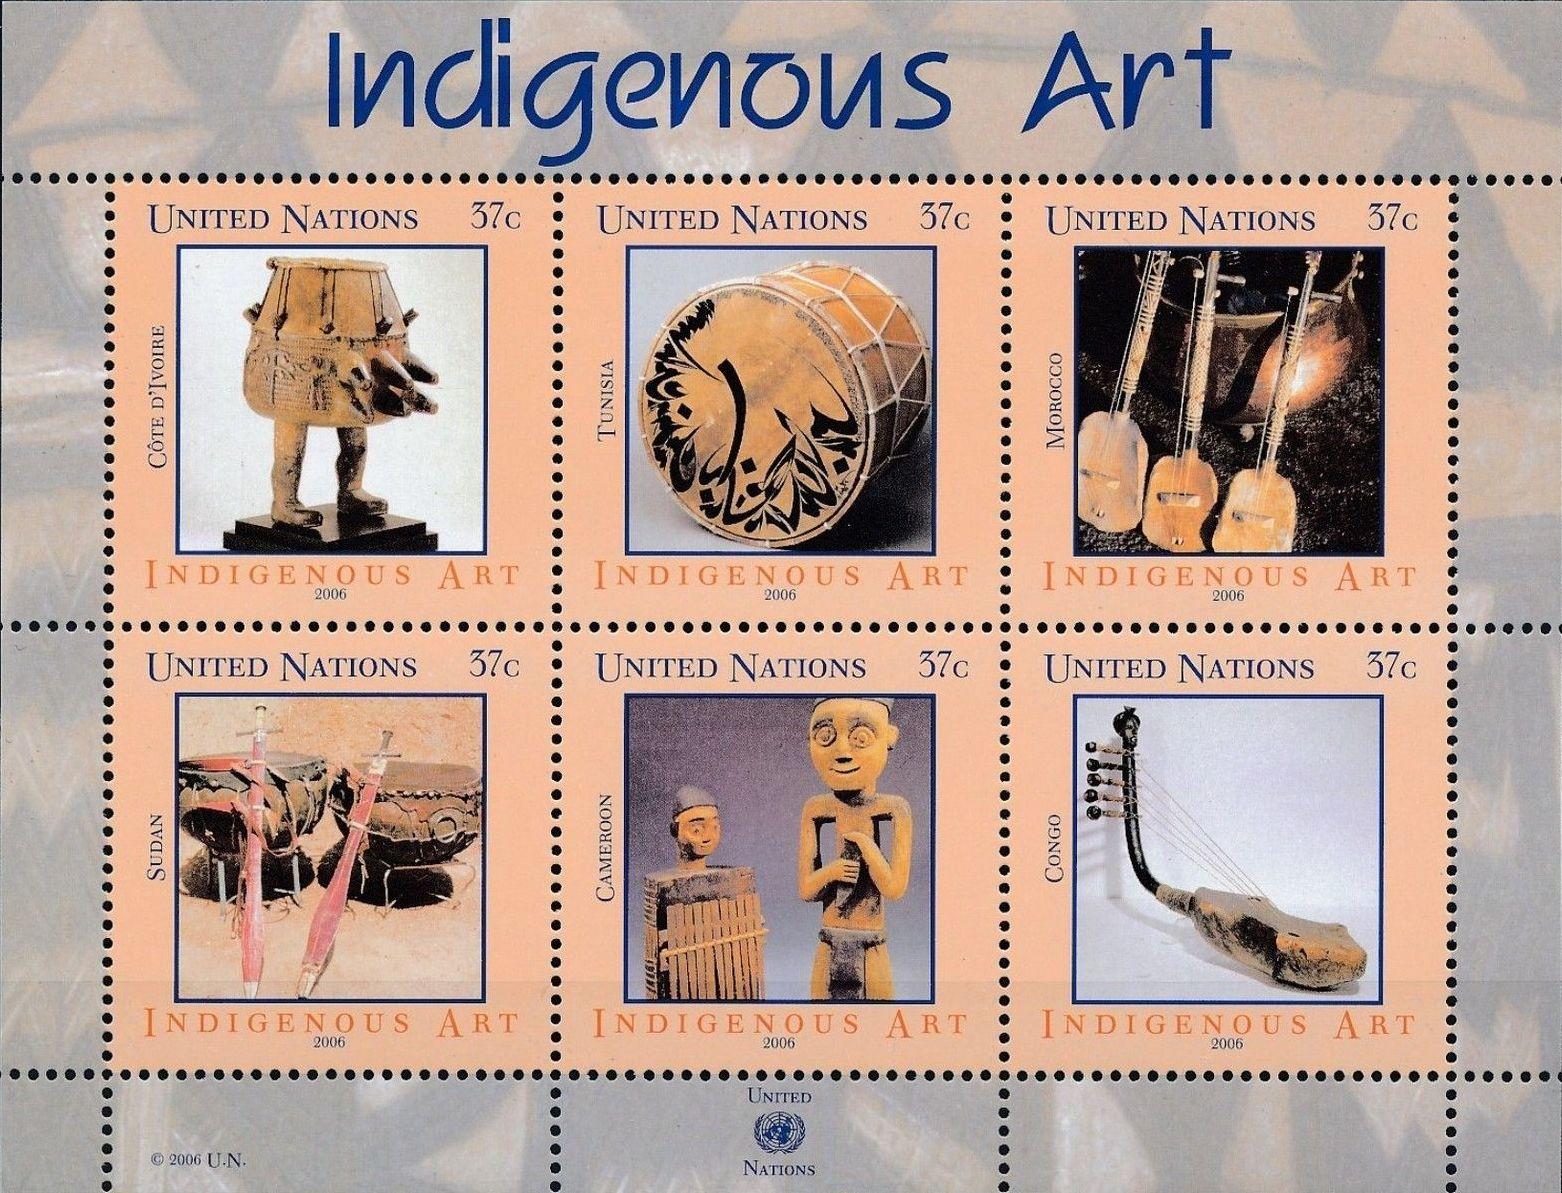 United Nations-New York 2006 Indigenous Art